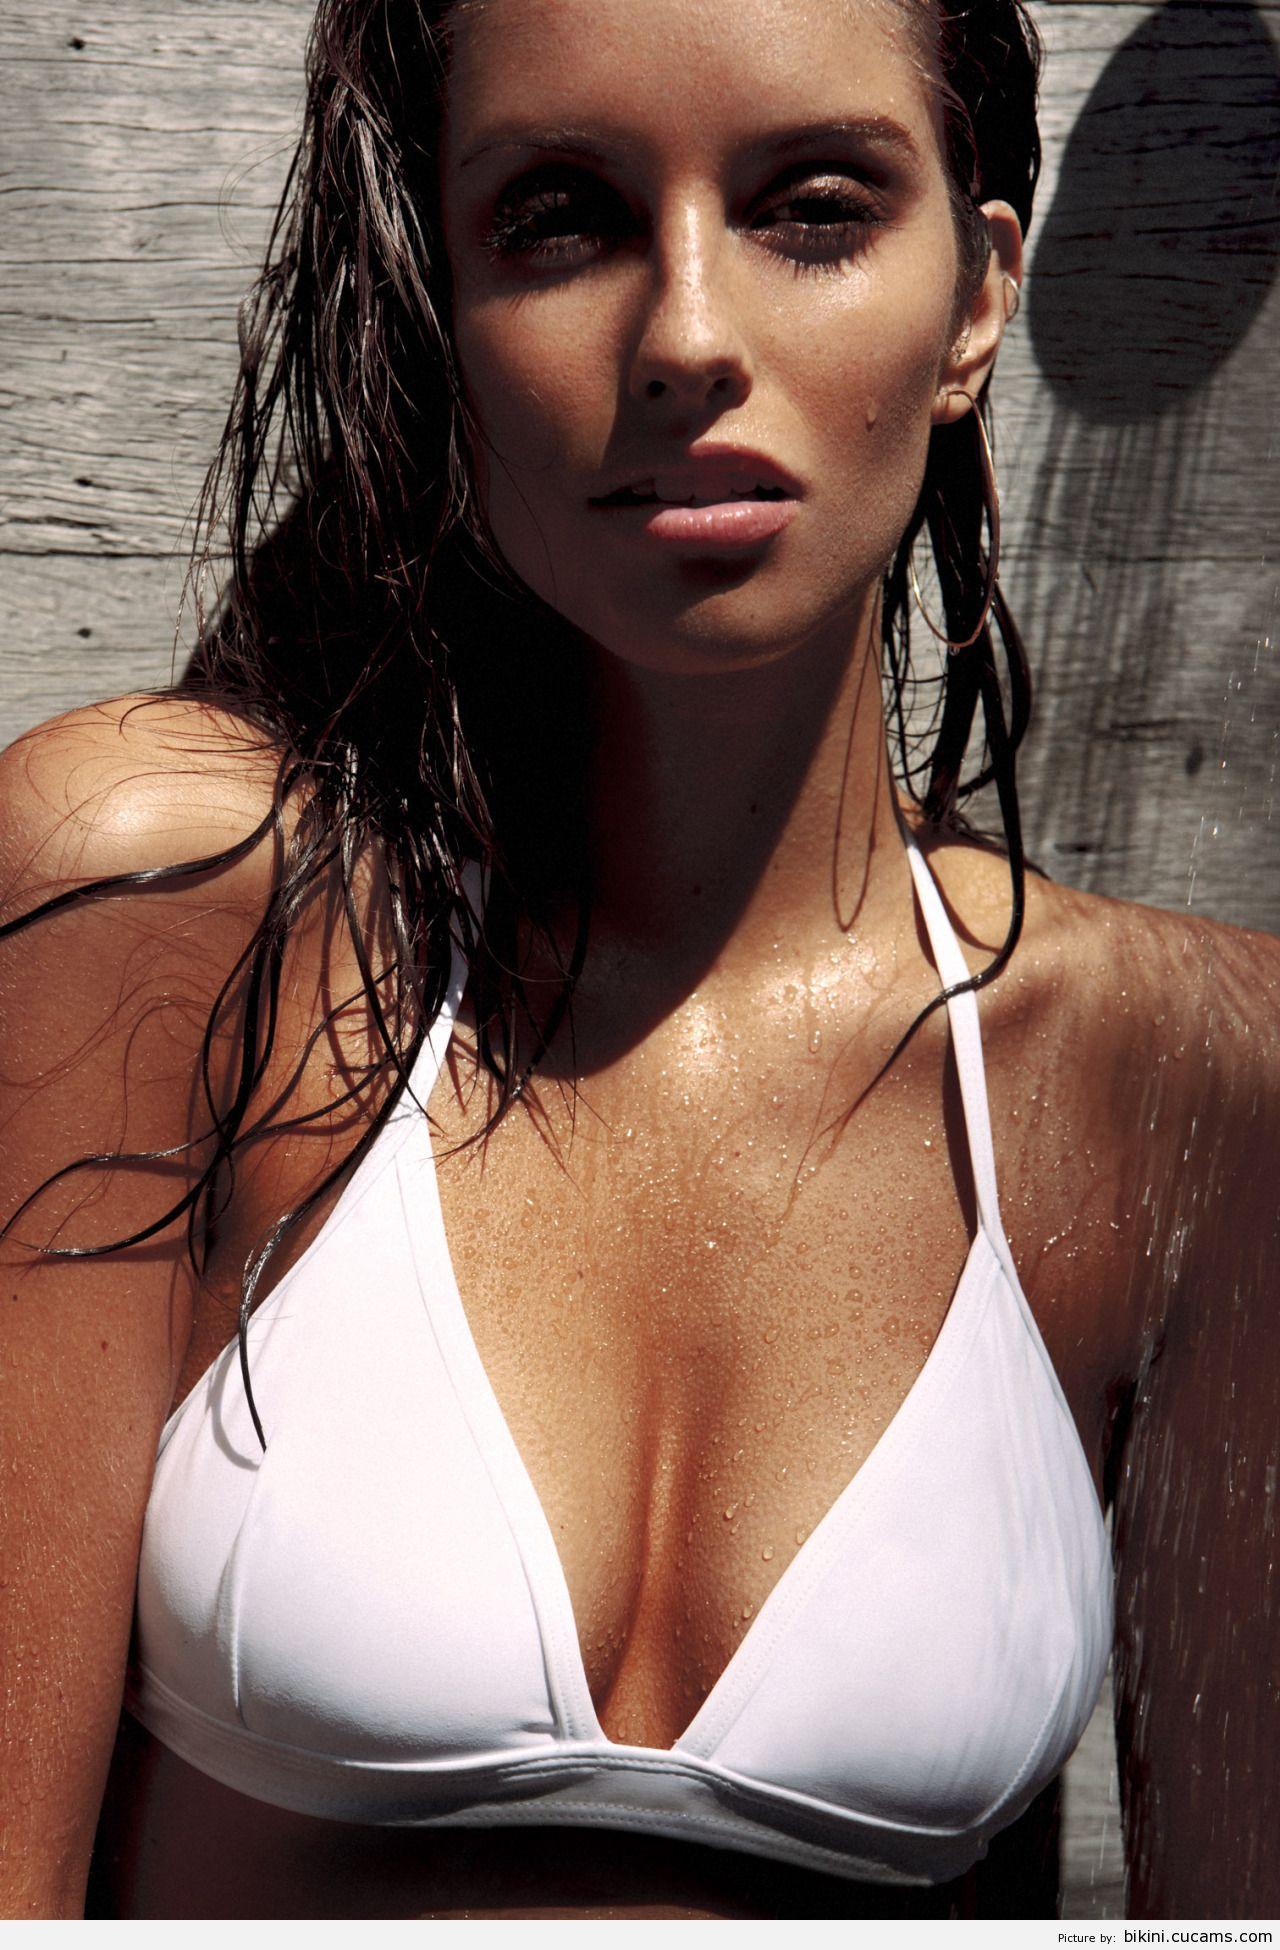 Bikini Slap Sport by bikini.cucams.com